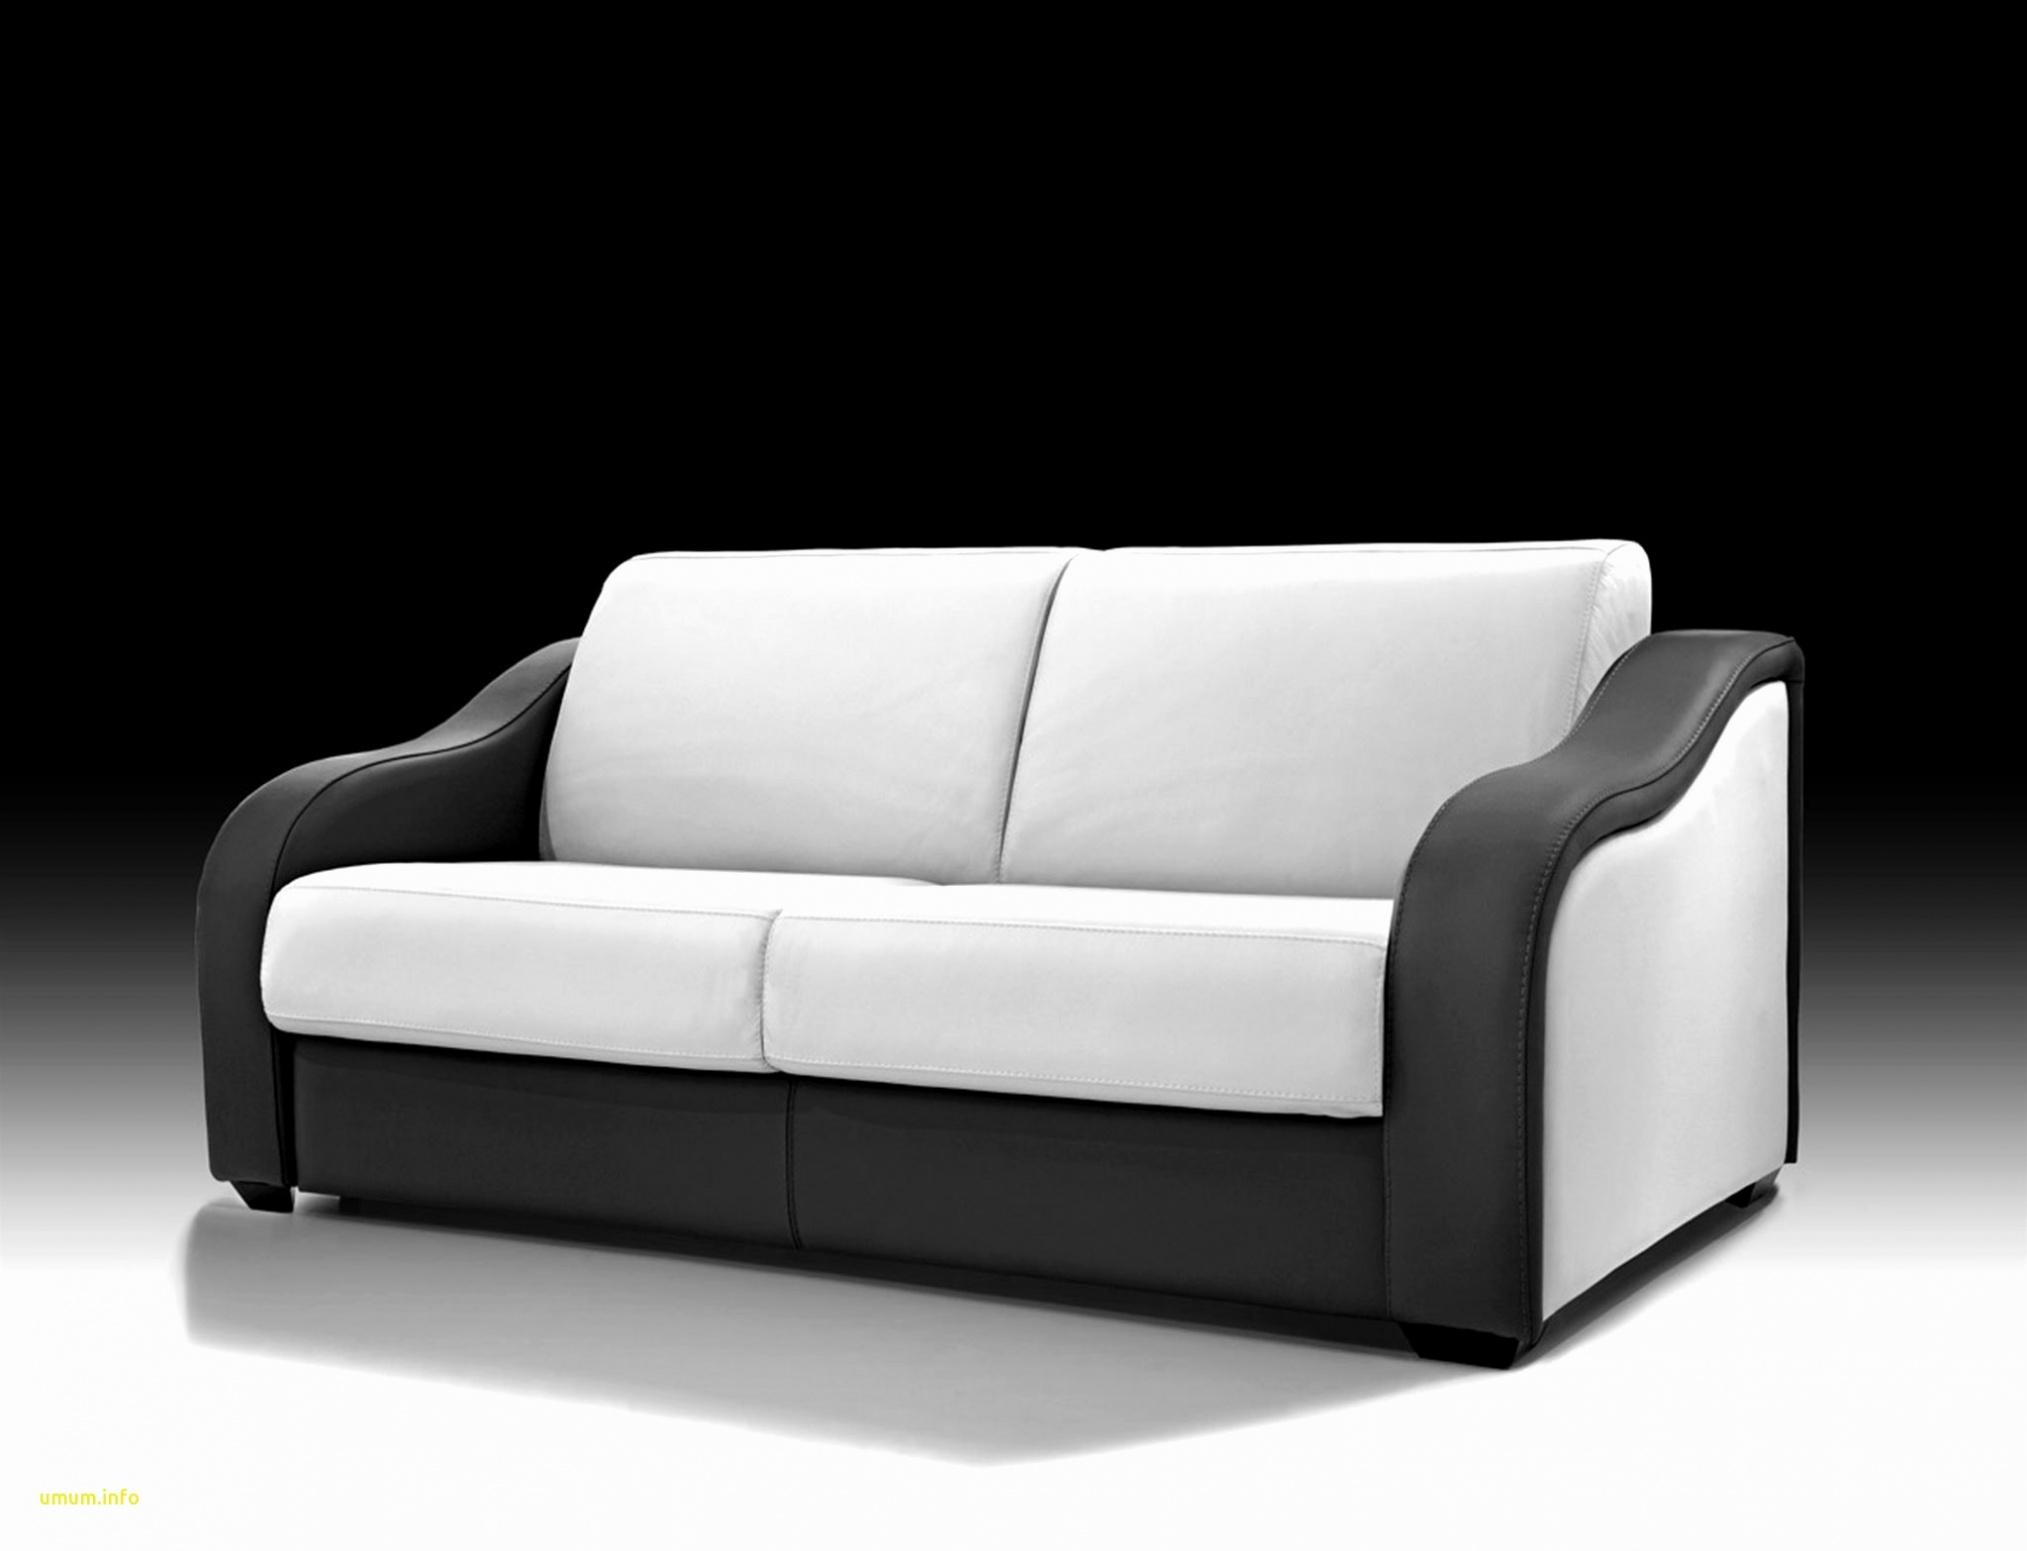 Canapé En Cuir Ikea Frais Photographie Maha De Canapé Gris Foncé Mahagranda De Home